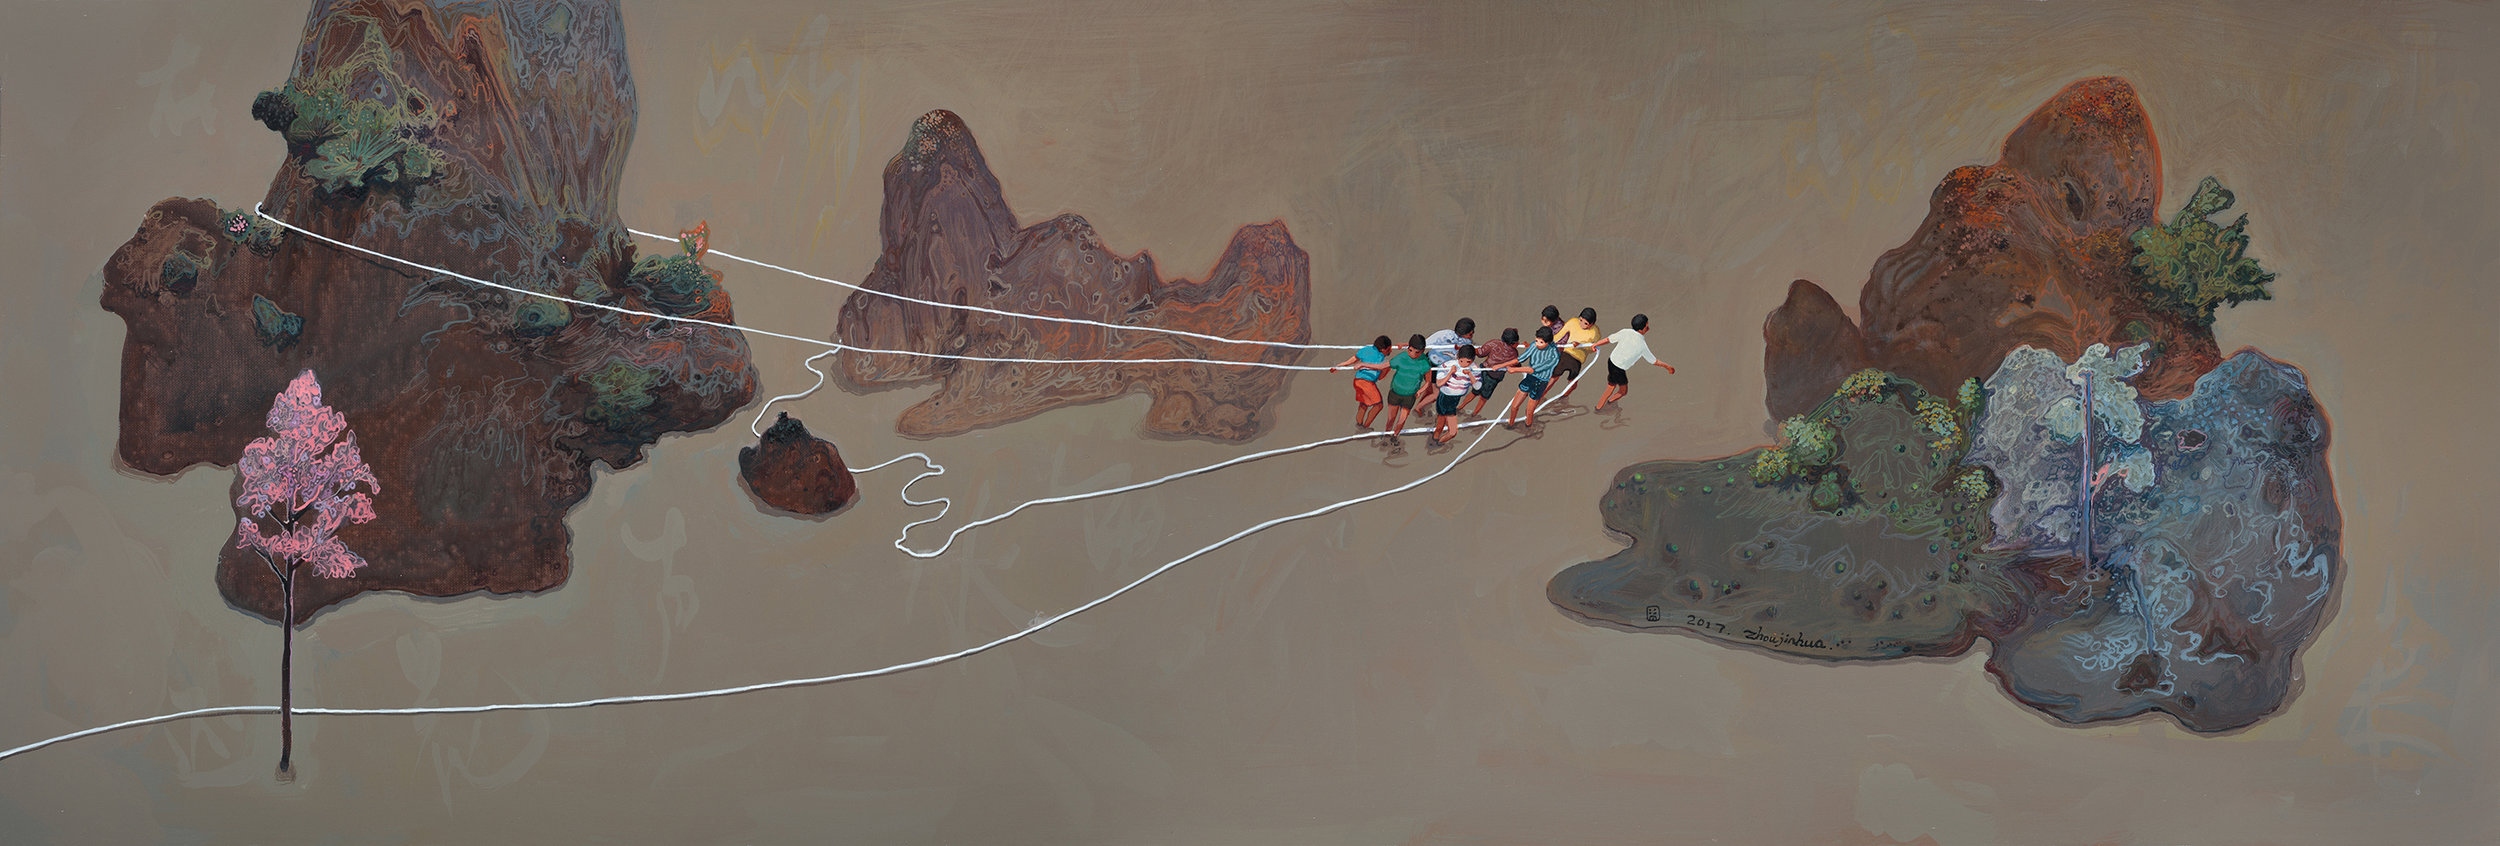 Zhou Jinhua 周金华, Moving Mountains 移山, 2017, Acrylic on canvas 布面丙烯, 41 x 121 cm